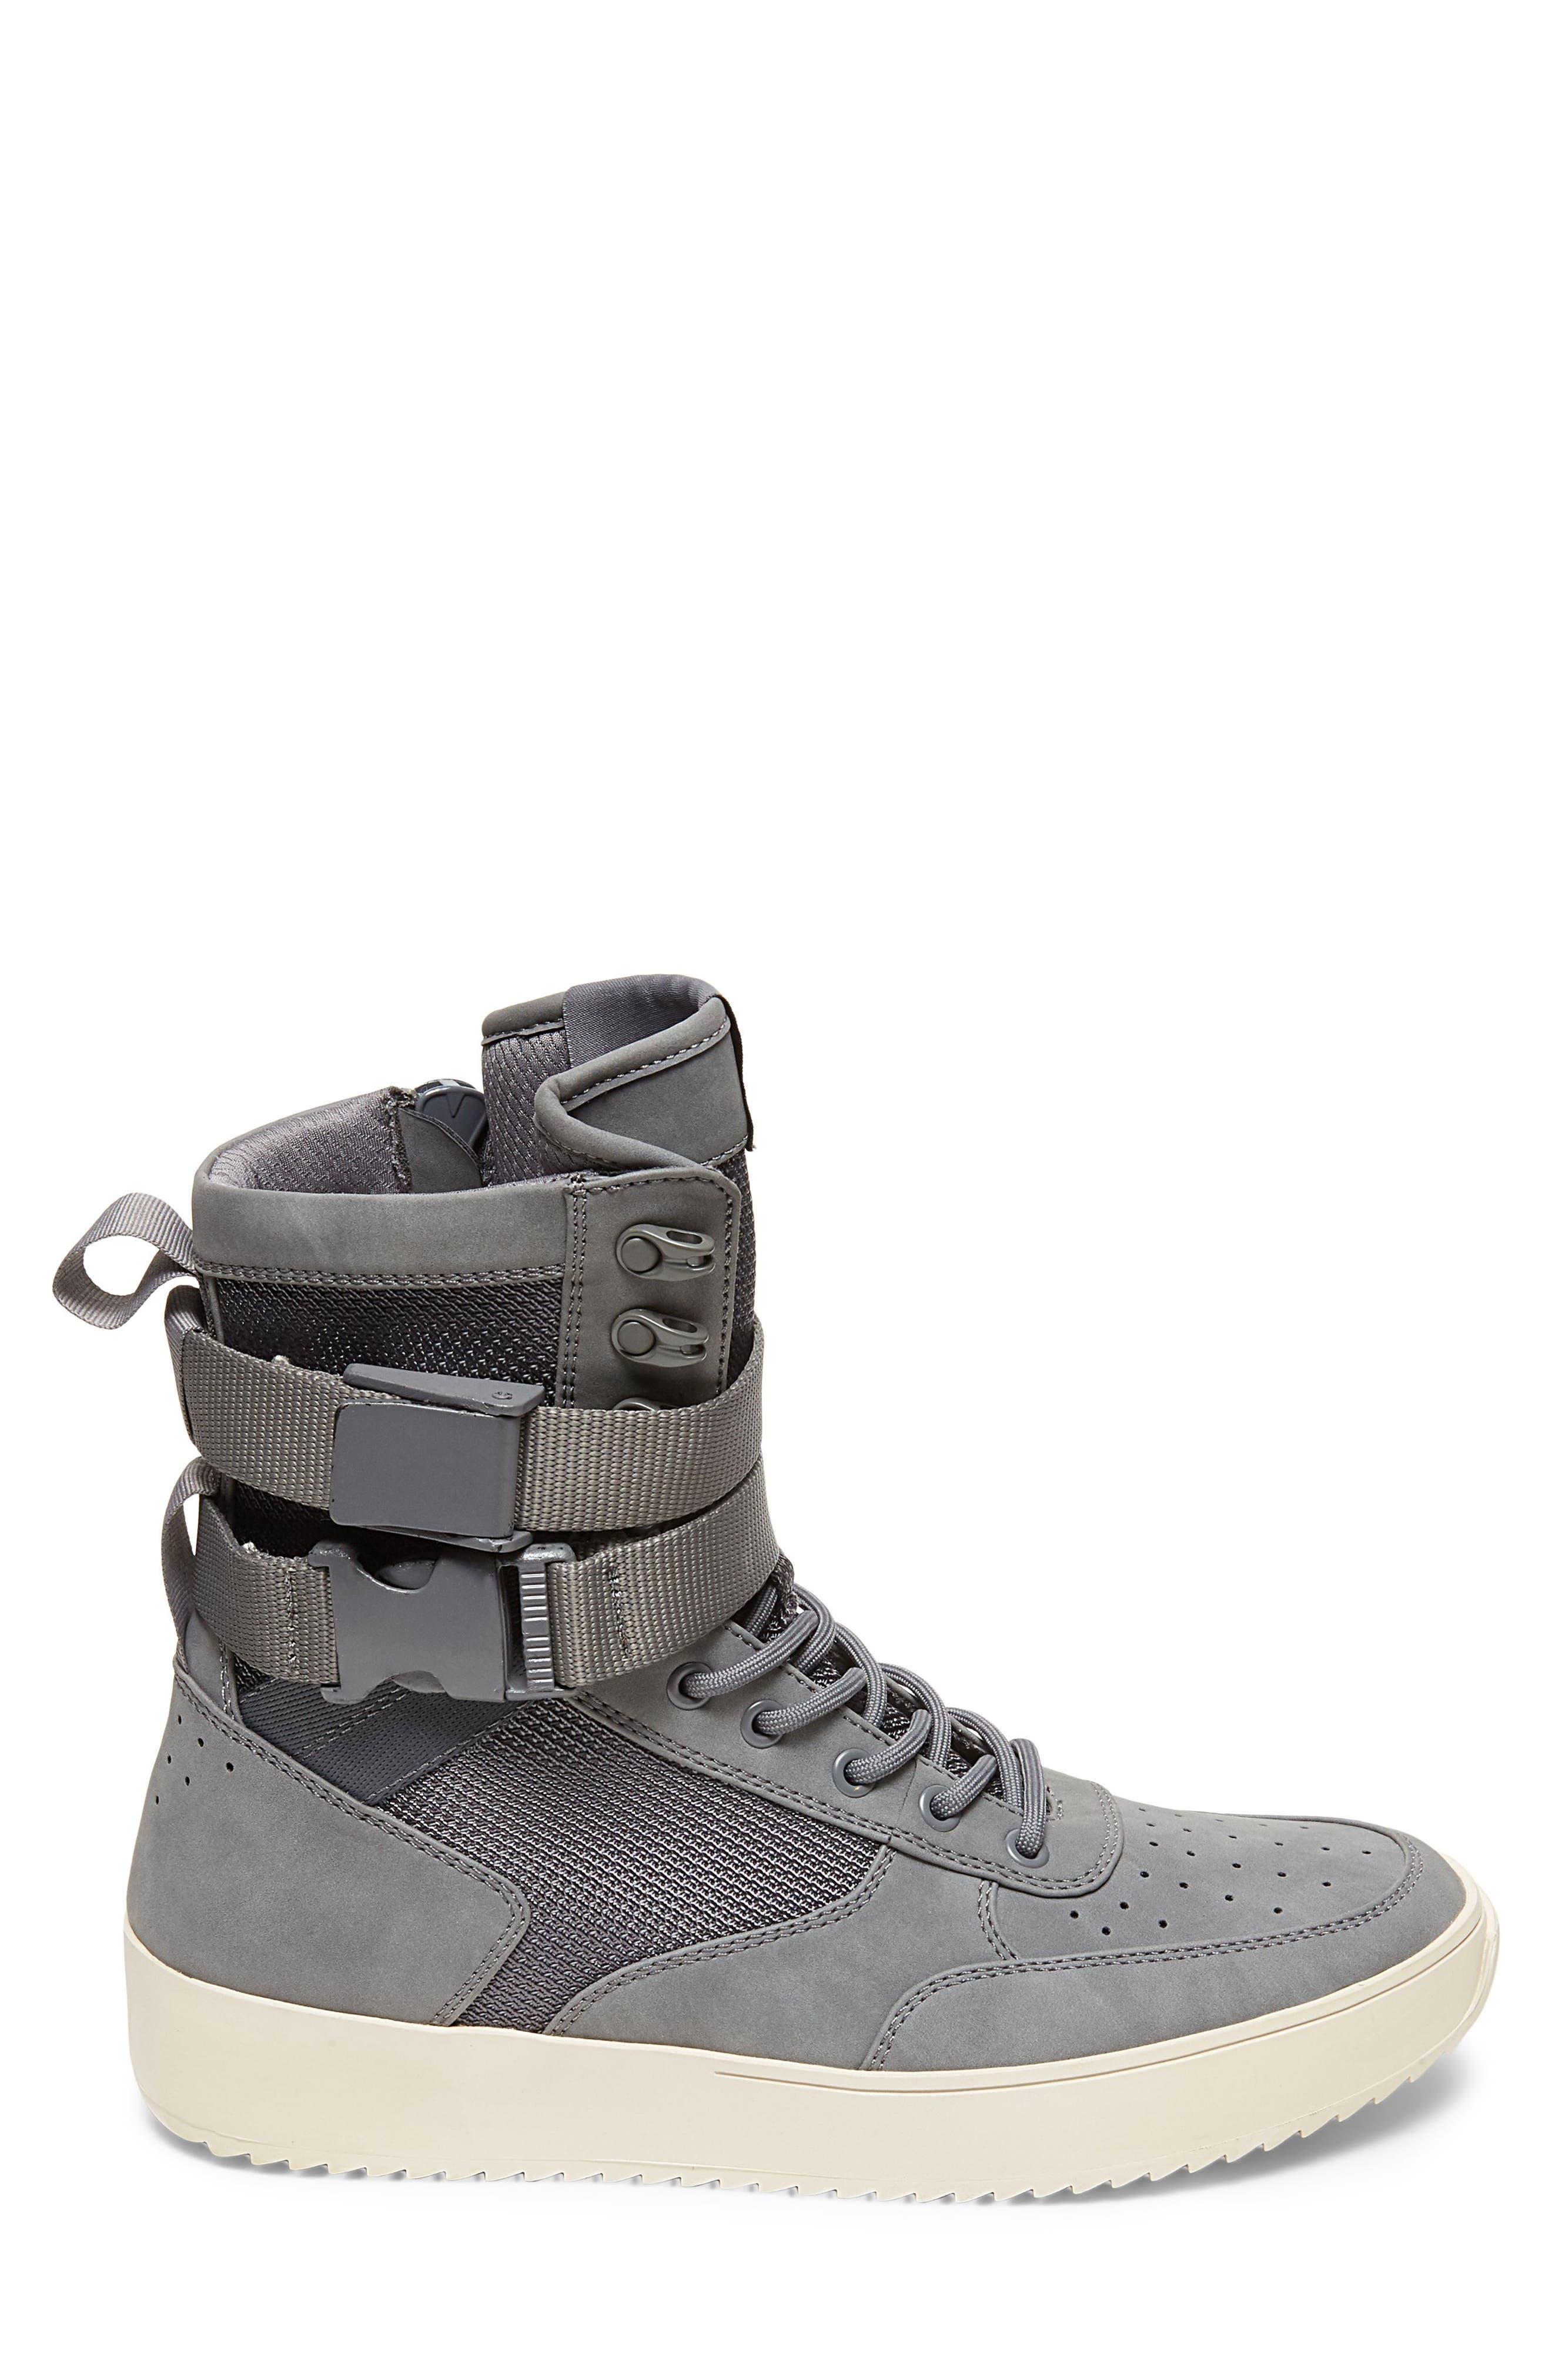 Zeroday Sneaker,                             Alternate thumbnail 8, color,